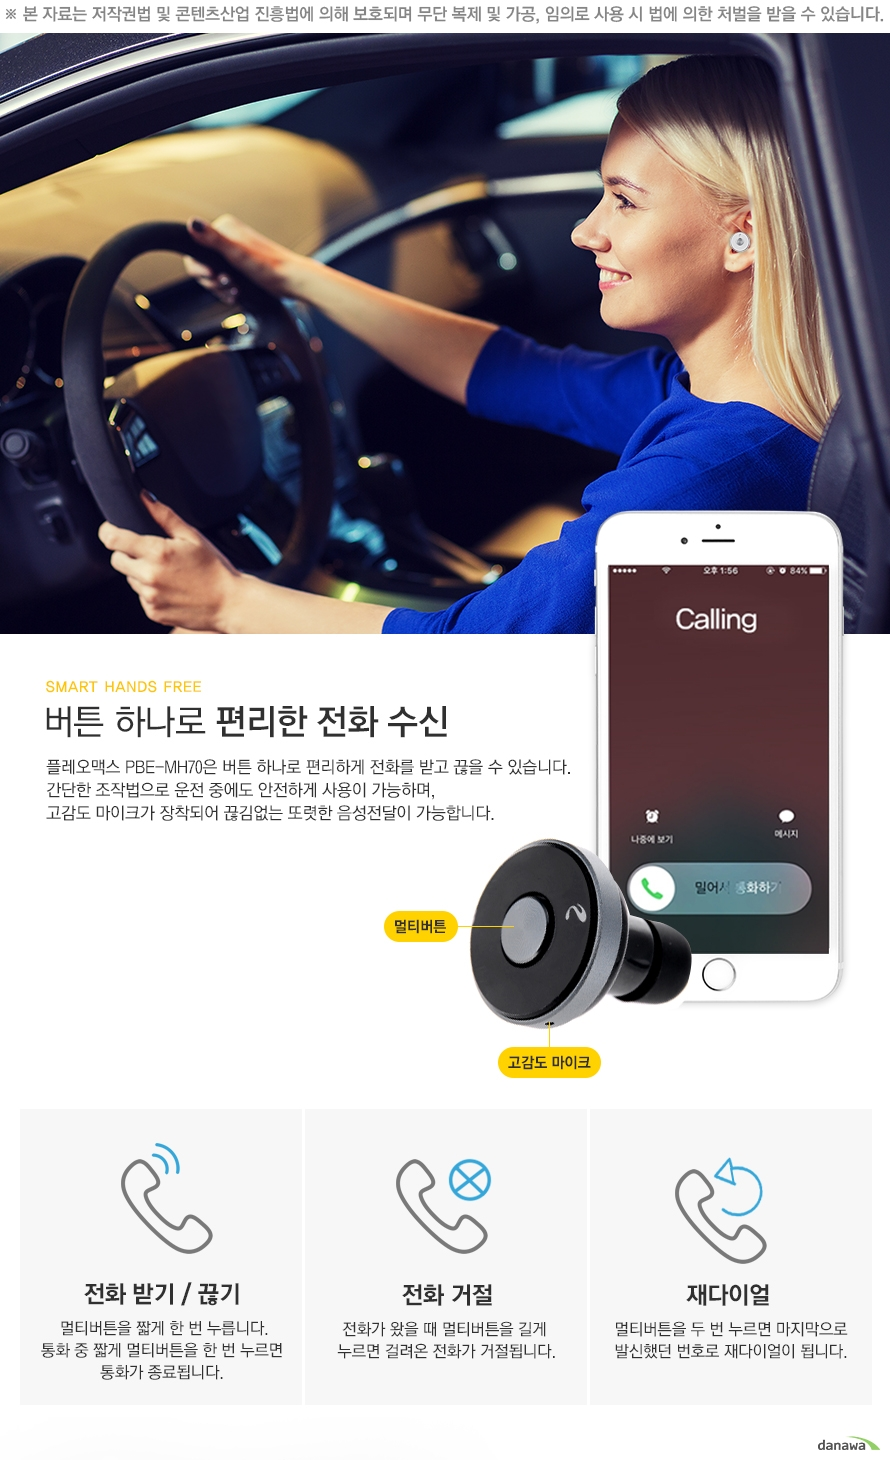 smart hand free 버튼 하나로 편리한 전화 수신 플레오맥스pbe-mh70은 버튼 하나로 편리하게 전화를 받고 끊을 수 있습니다 간단한 조작법으로 운전 중에도 안전하게 사용이 가능하며 고감도 마이크가 장착되어 끊김없는 또렷한 음성전달이 가능합니다 멀티버튼 고감도 마이크 전화 받기 끊기 멀티버튼을 짧게 한번 누릅니다 통화 중 짧게 멀티버튼을 한 번 누르면 통화가 종료됩니다. 전화 거절 전화가 왔을 때 멀티 버튼을 길게 누르면 걸려온 전화가 거절됩니다. 재다이얼 멀티버튼을 두 번 누르면 마지막으로 발신했던 번호로 재다이얼이 됩니다.